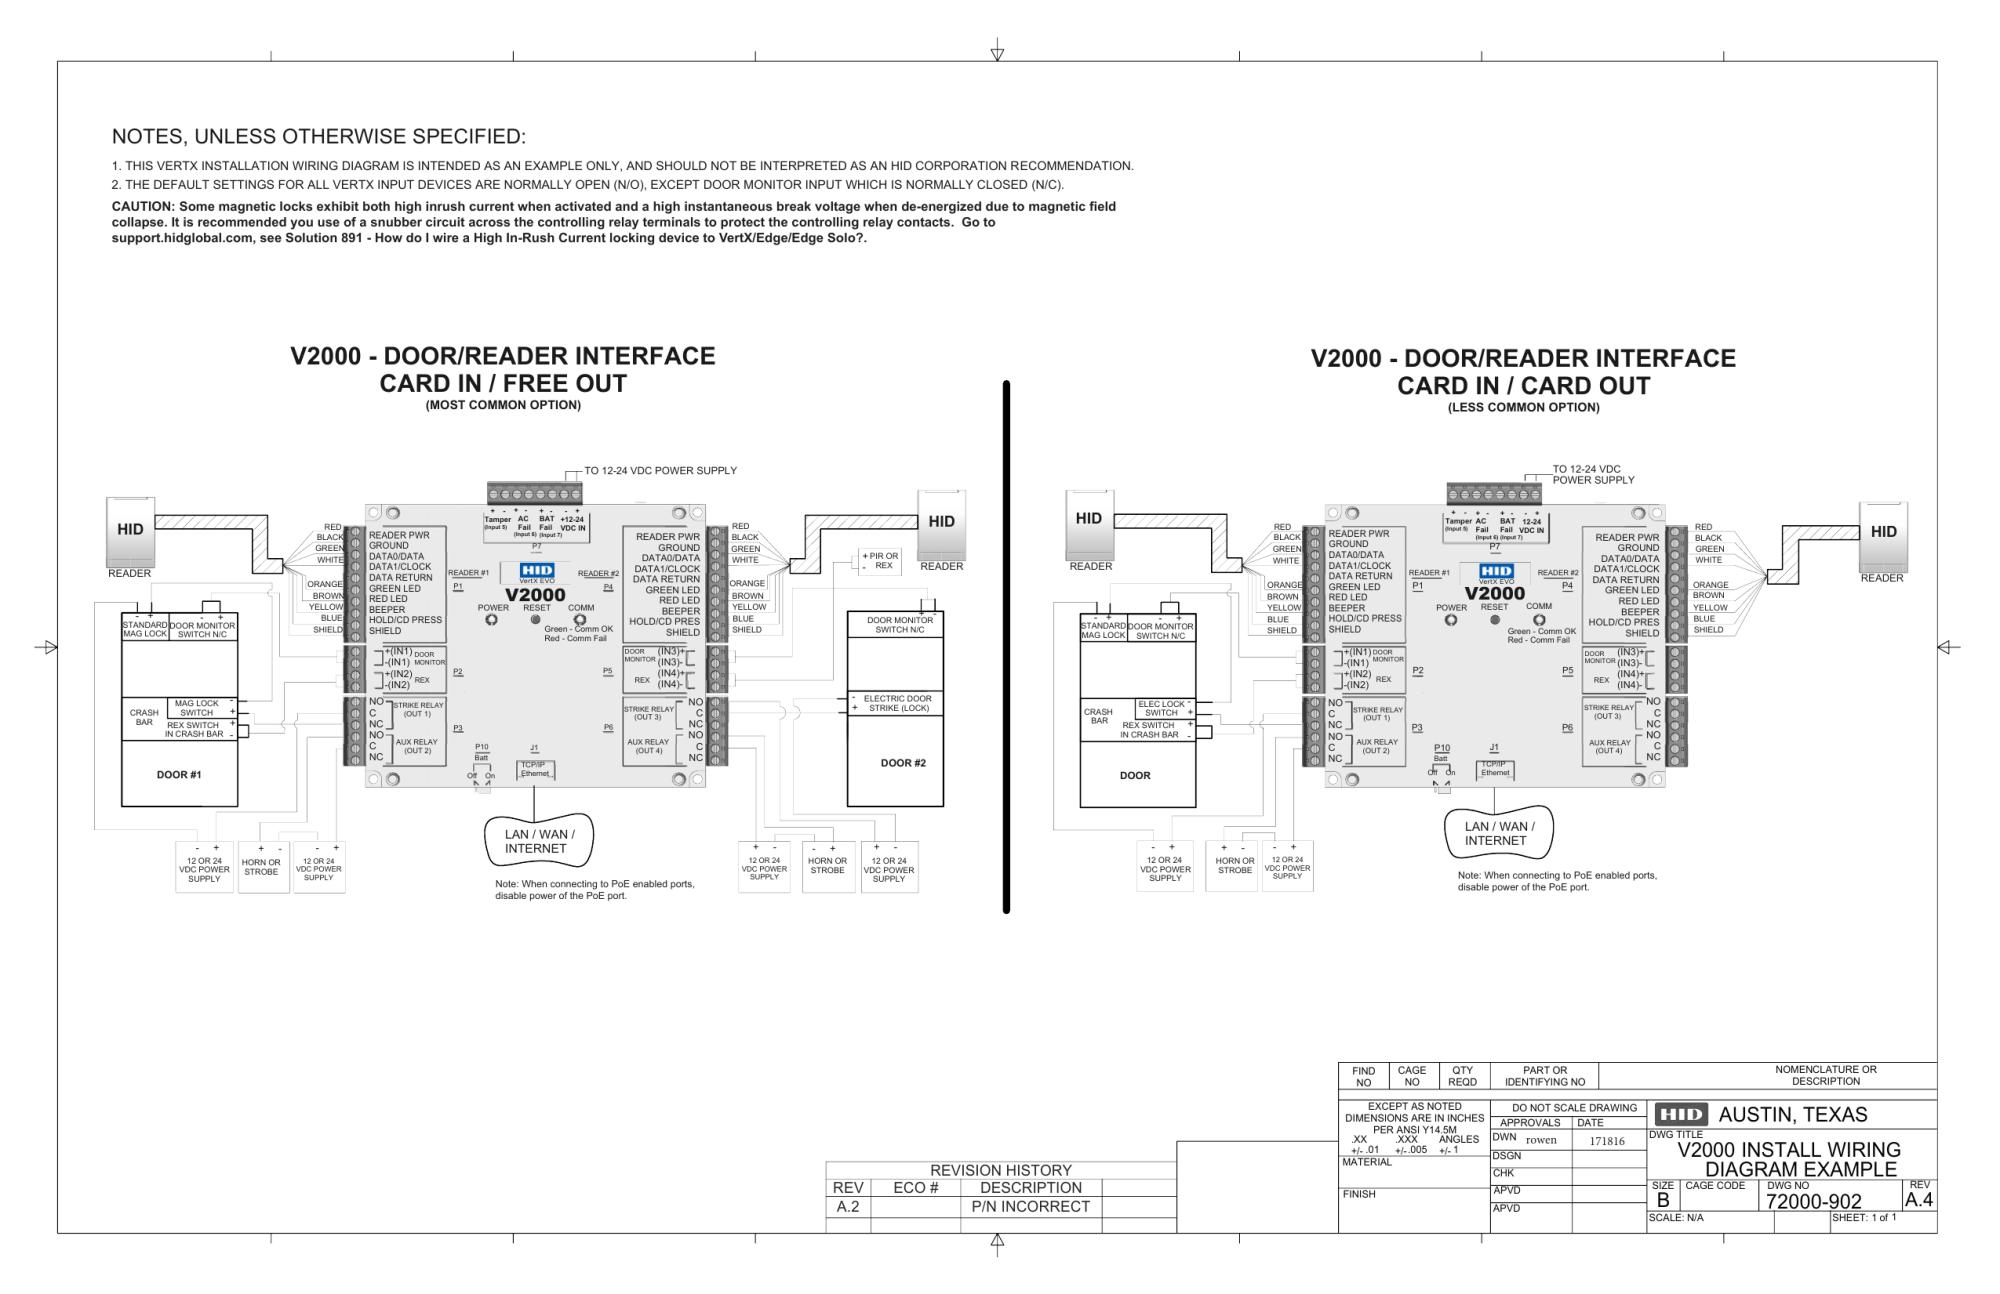 hight resolution of vertx evo v2000 wiring example manualzz com v2000 wiring diagram v2000 wiring diagram